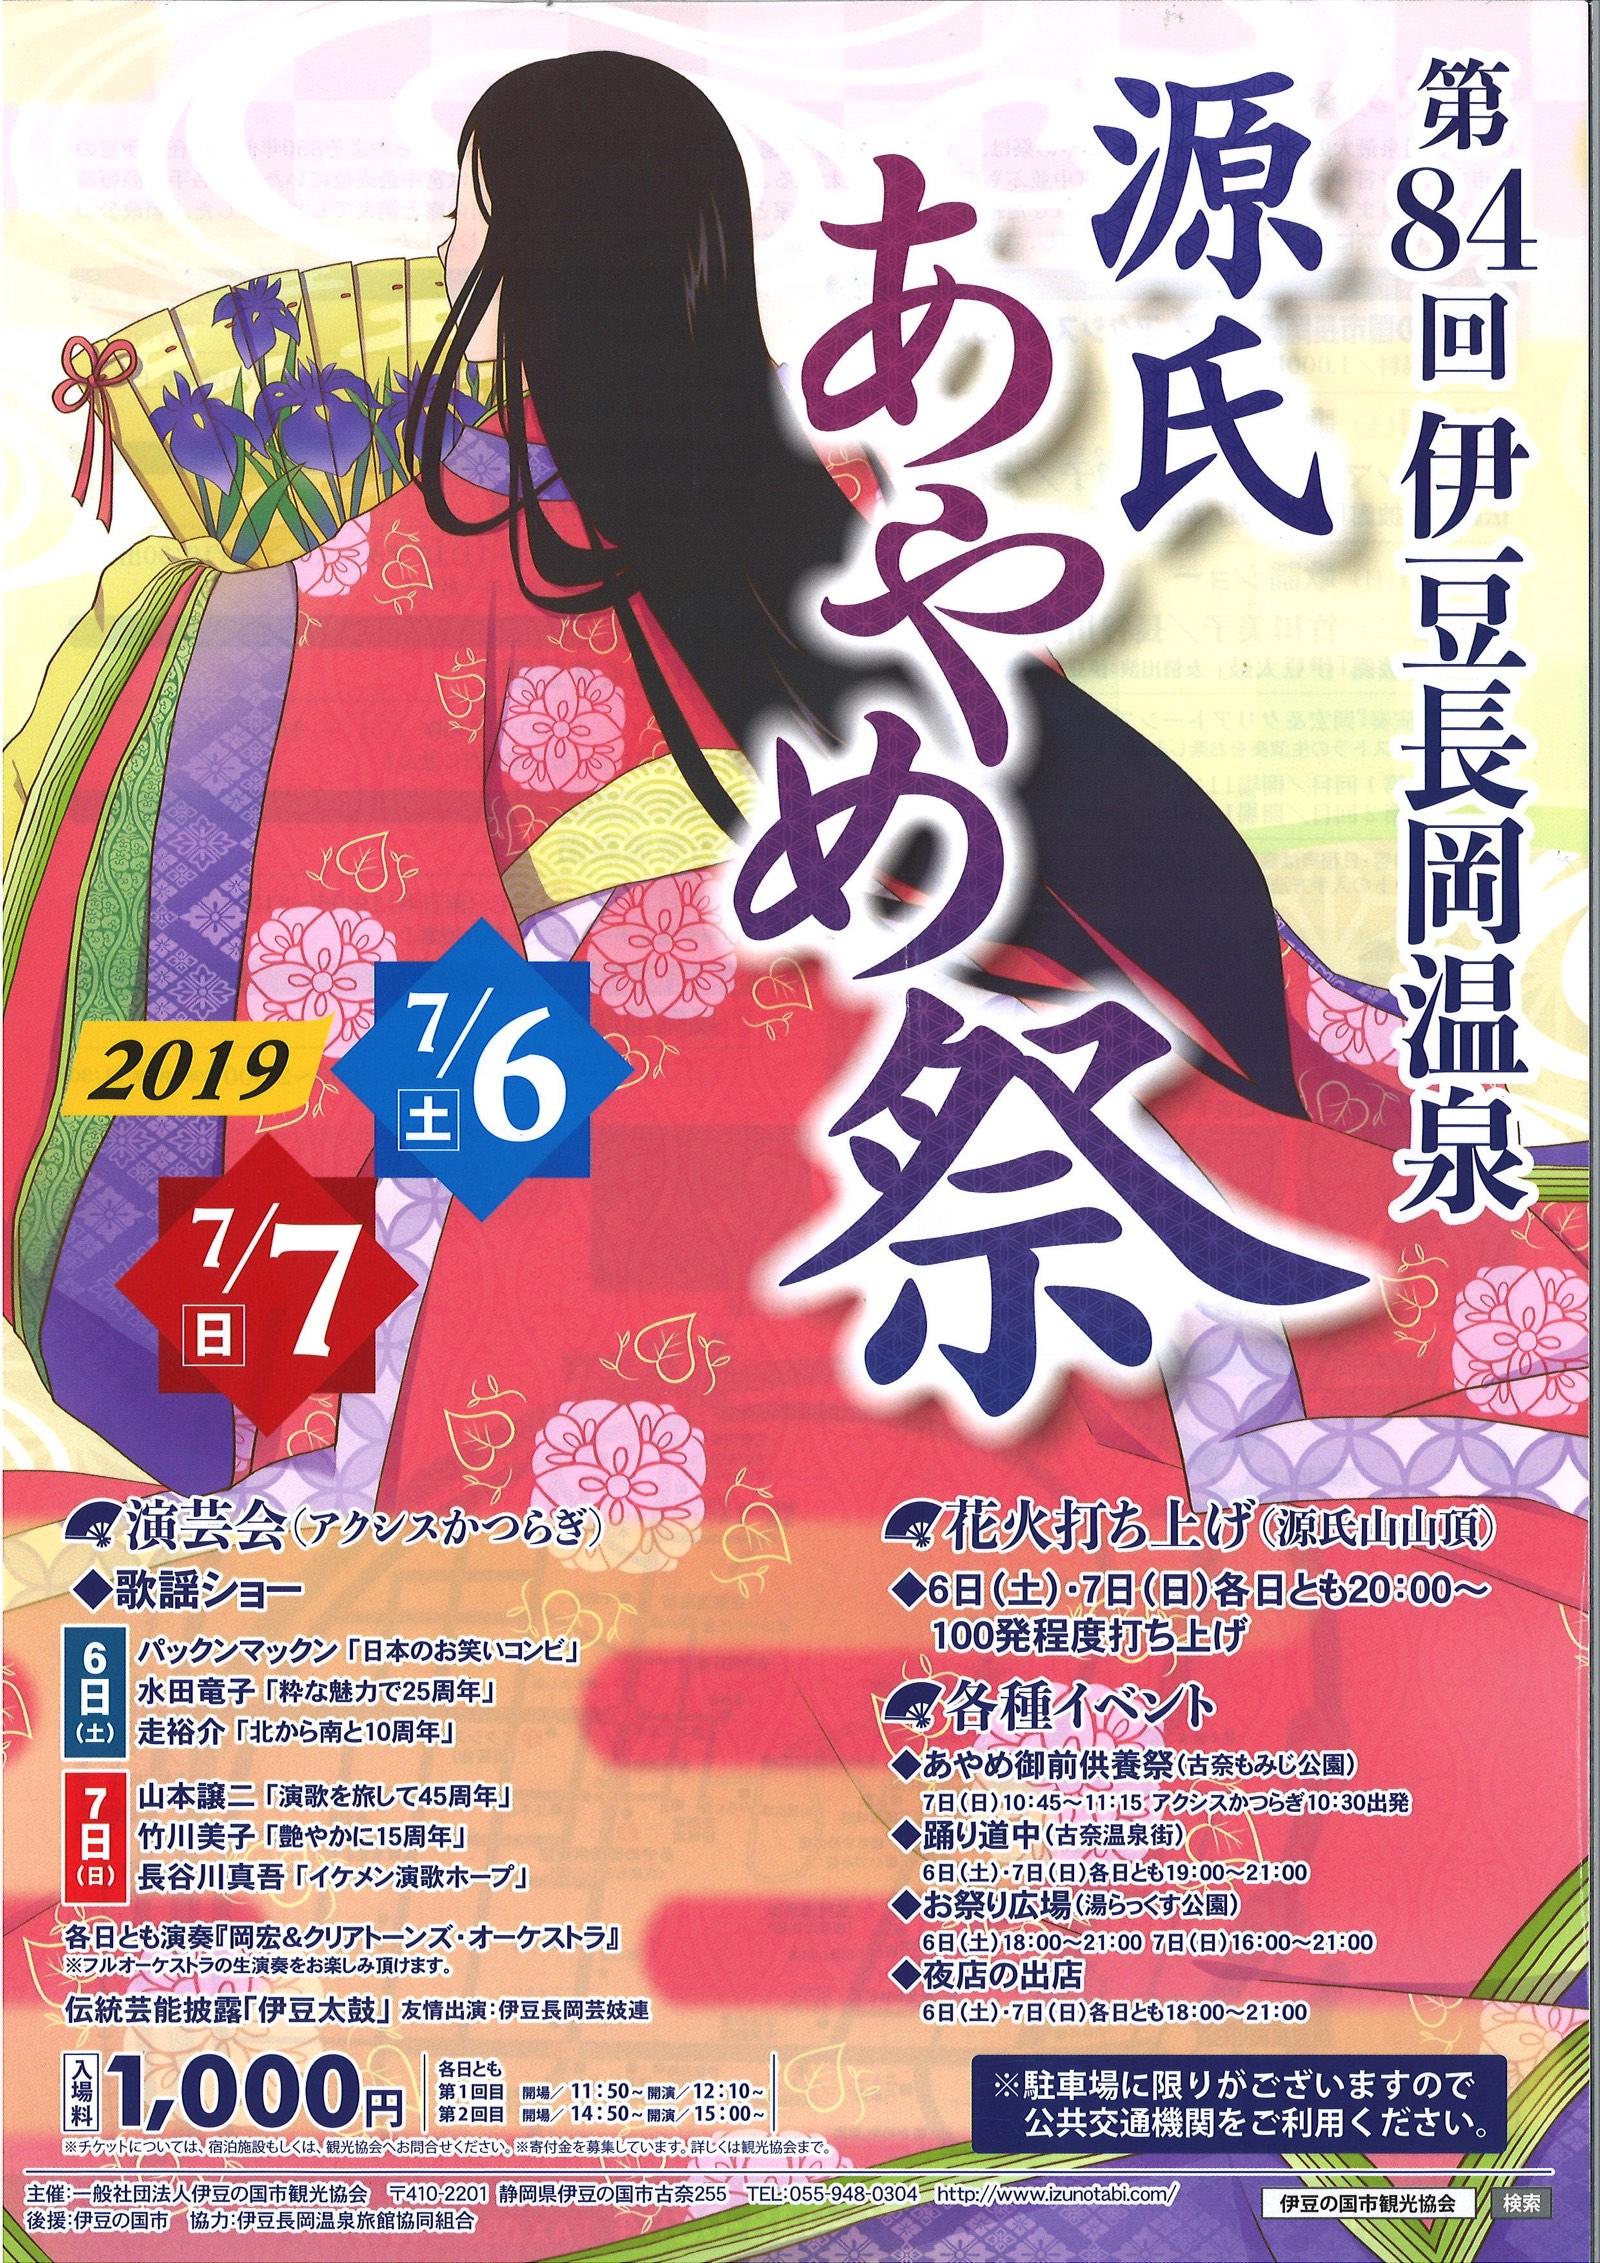 align:none link:0 alt:0 7月6日(土)・7日(日) 第84回源氏あやめ祭開催!l